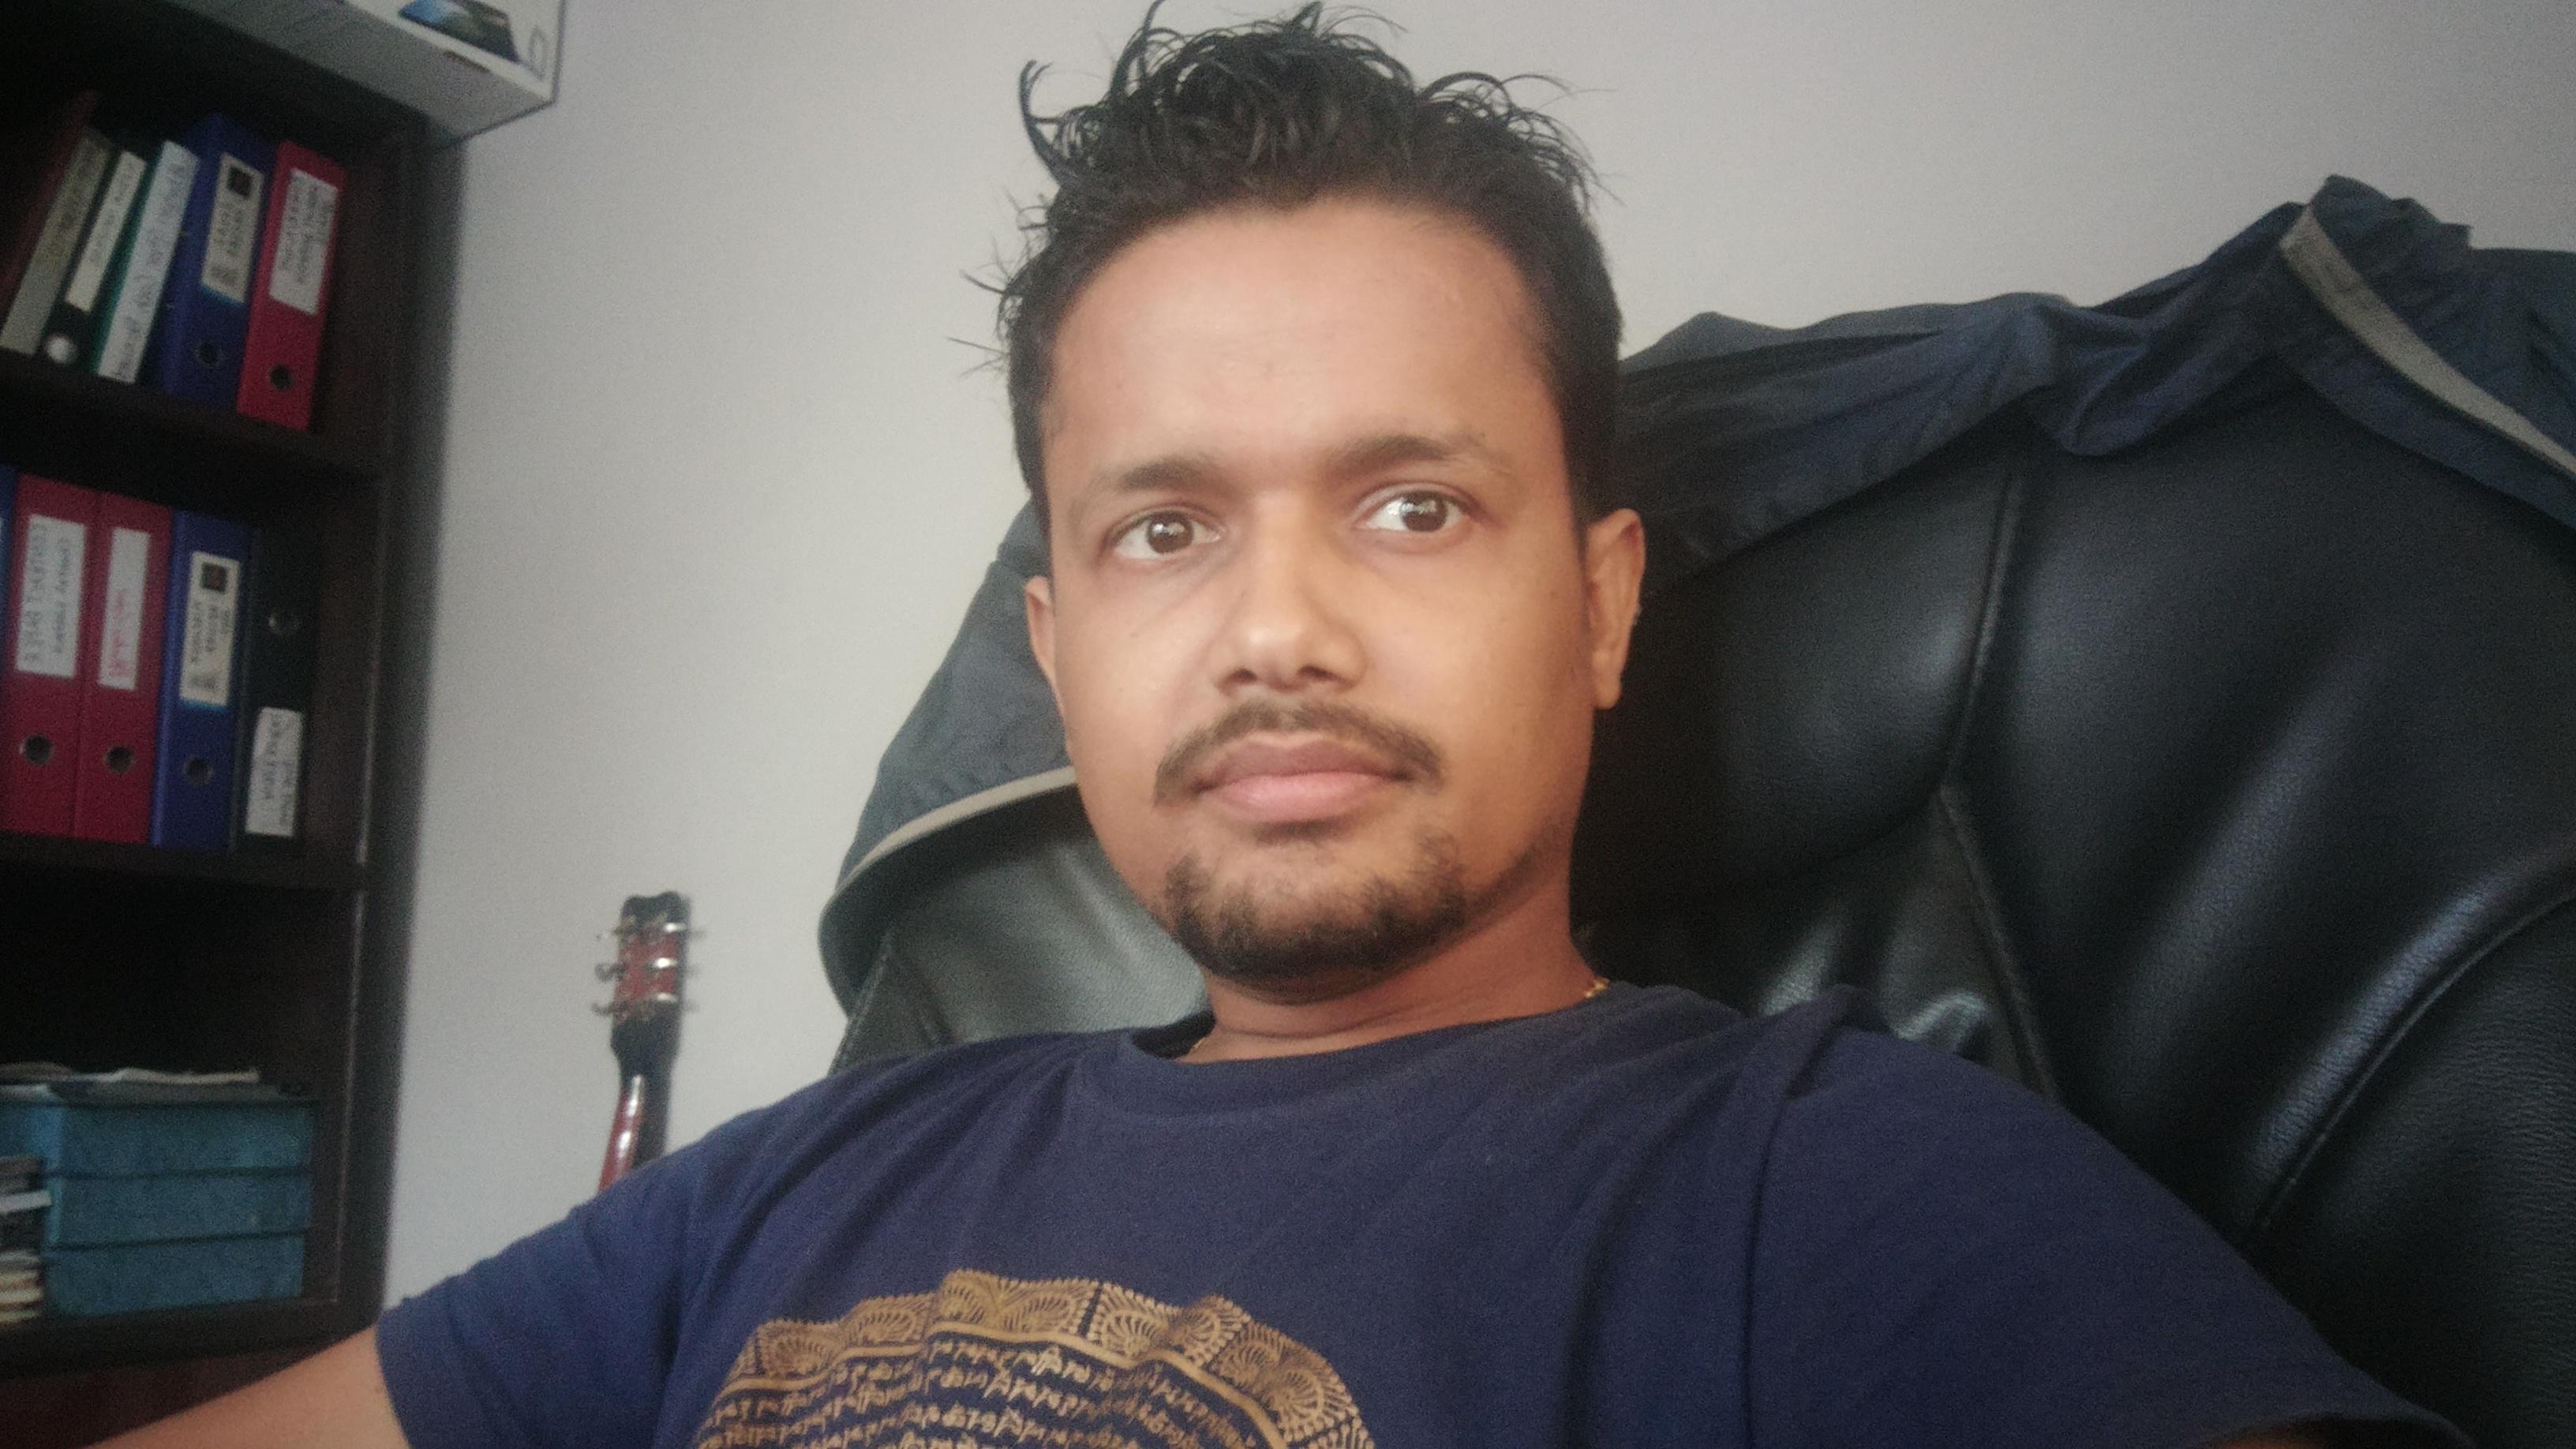 Priyash Pokharel